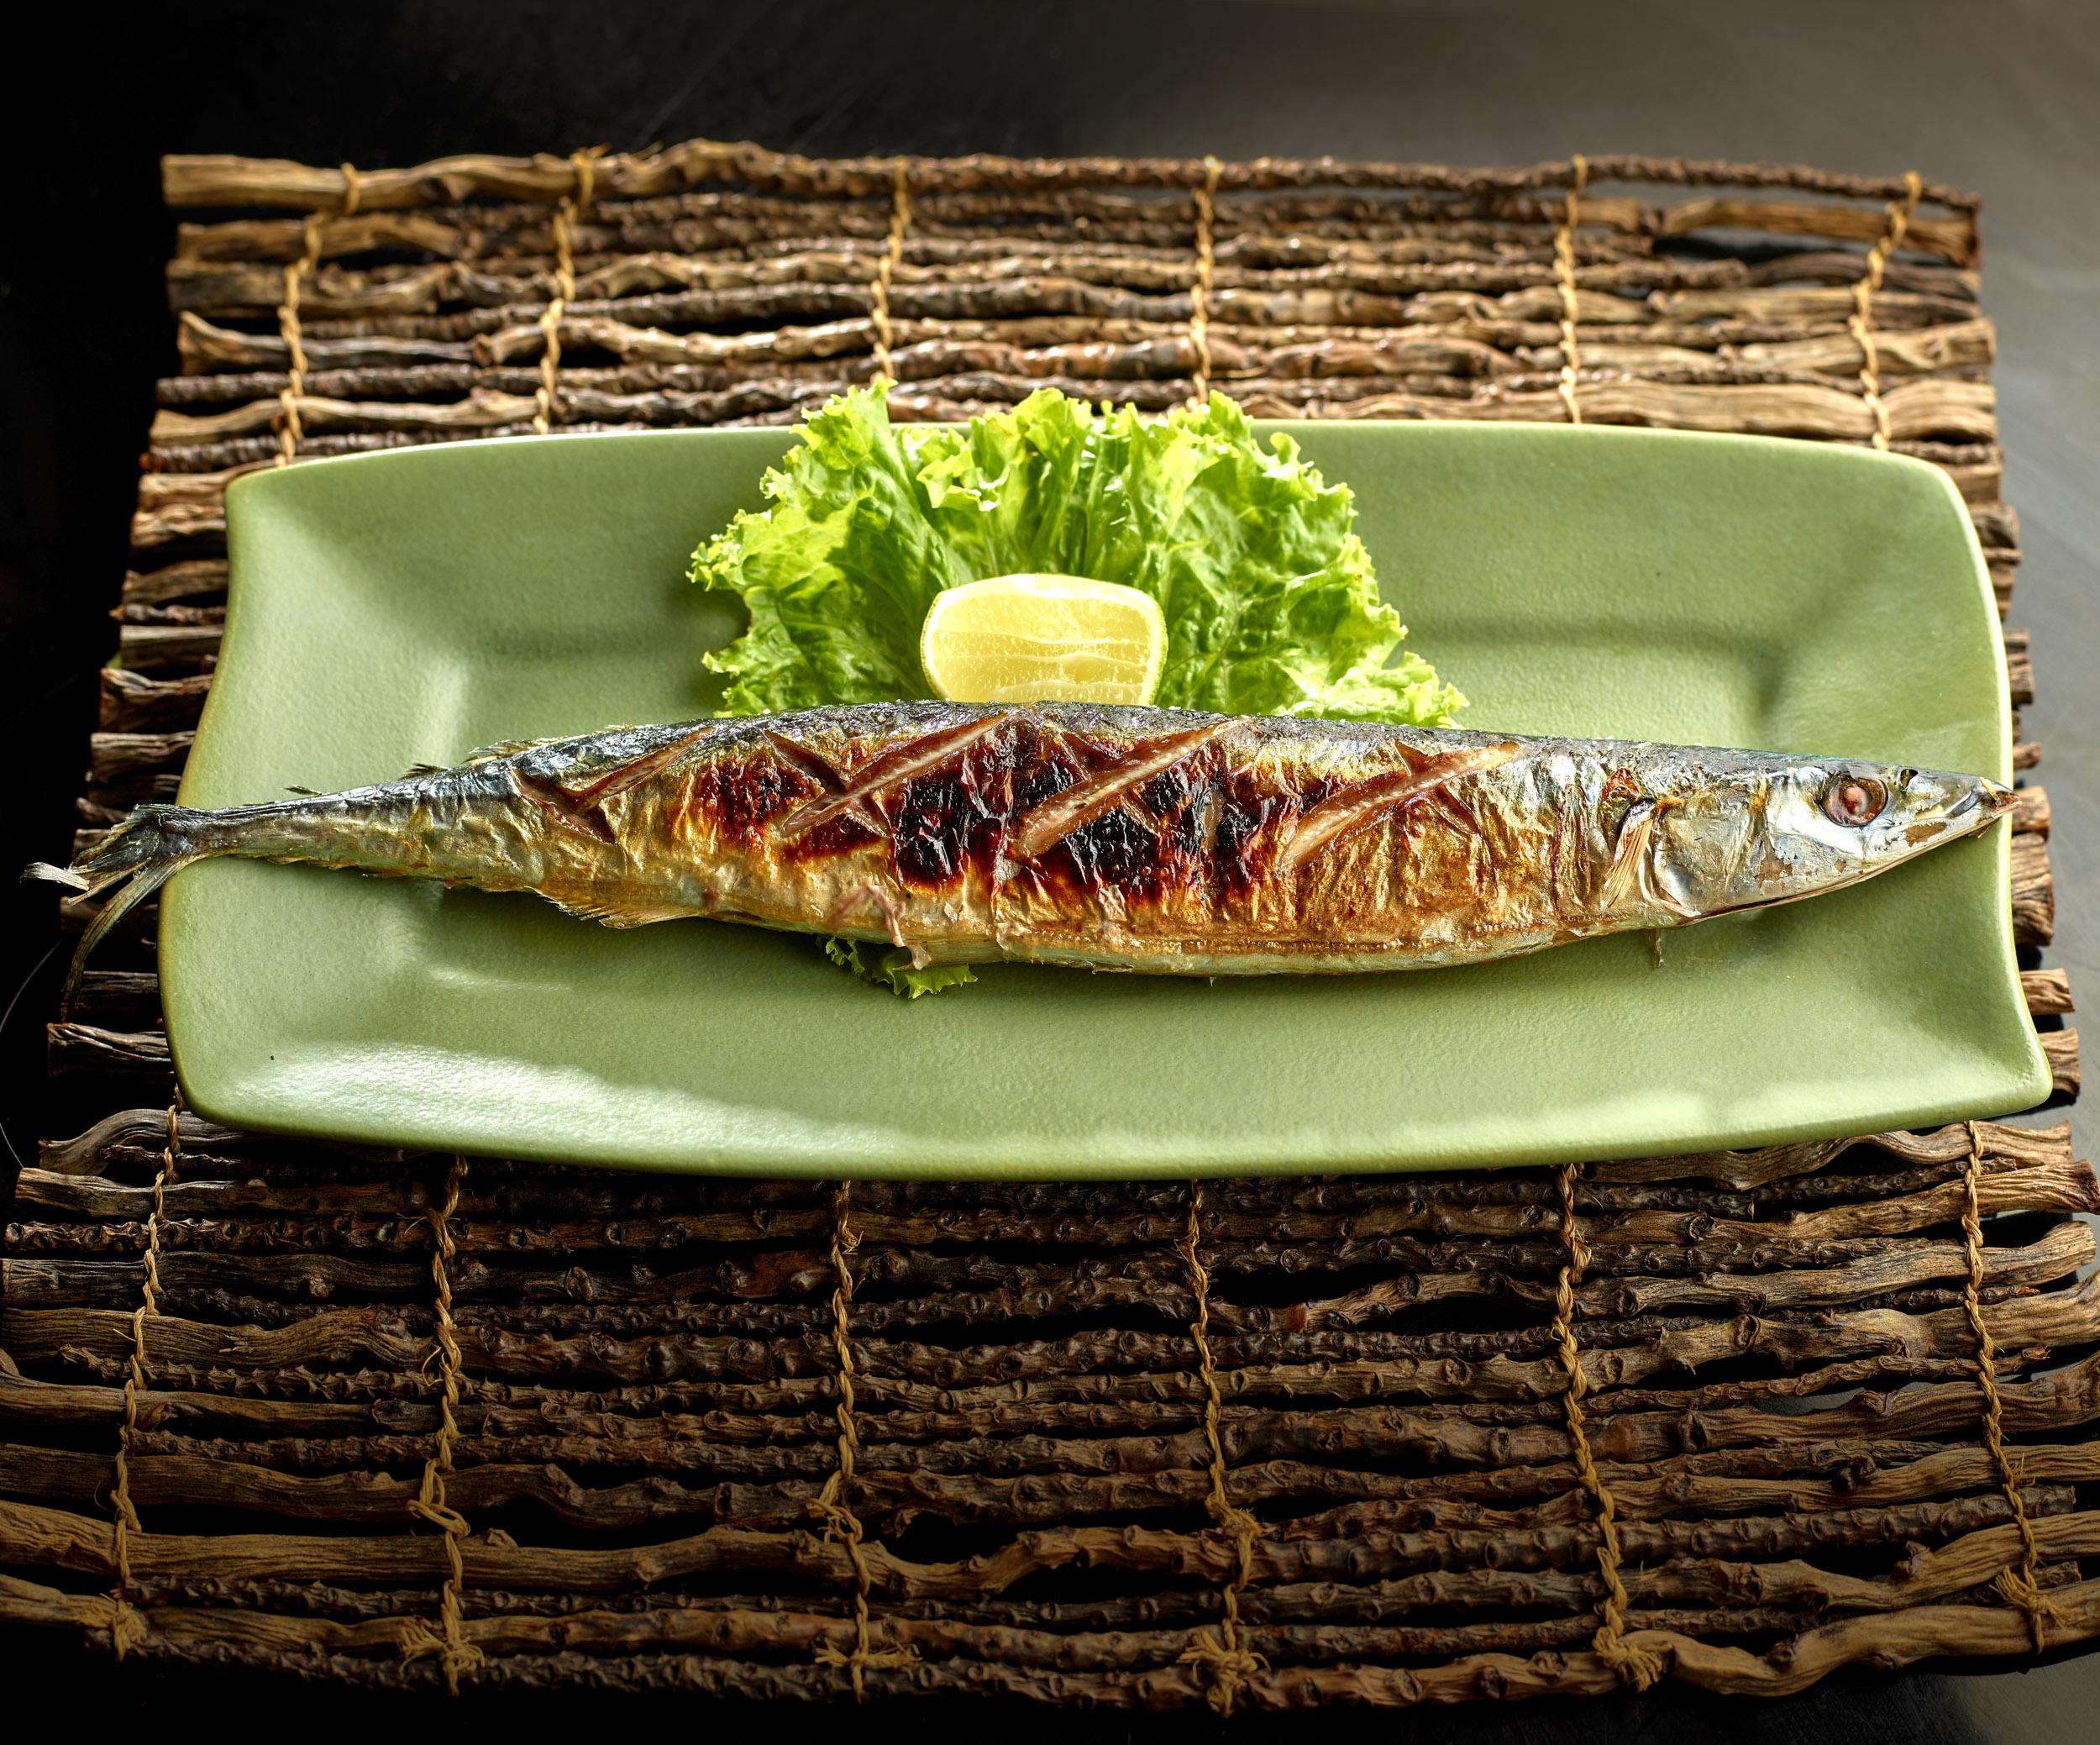 Toro. Japanese Food Restaurant Jakarta. | Food Photography by Bacteria Photography.